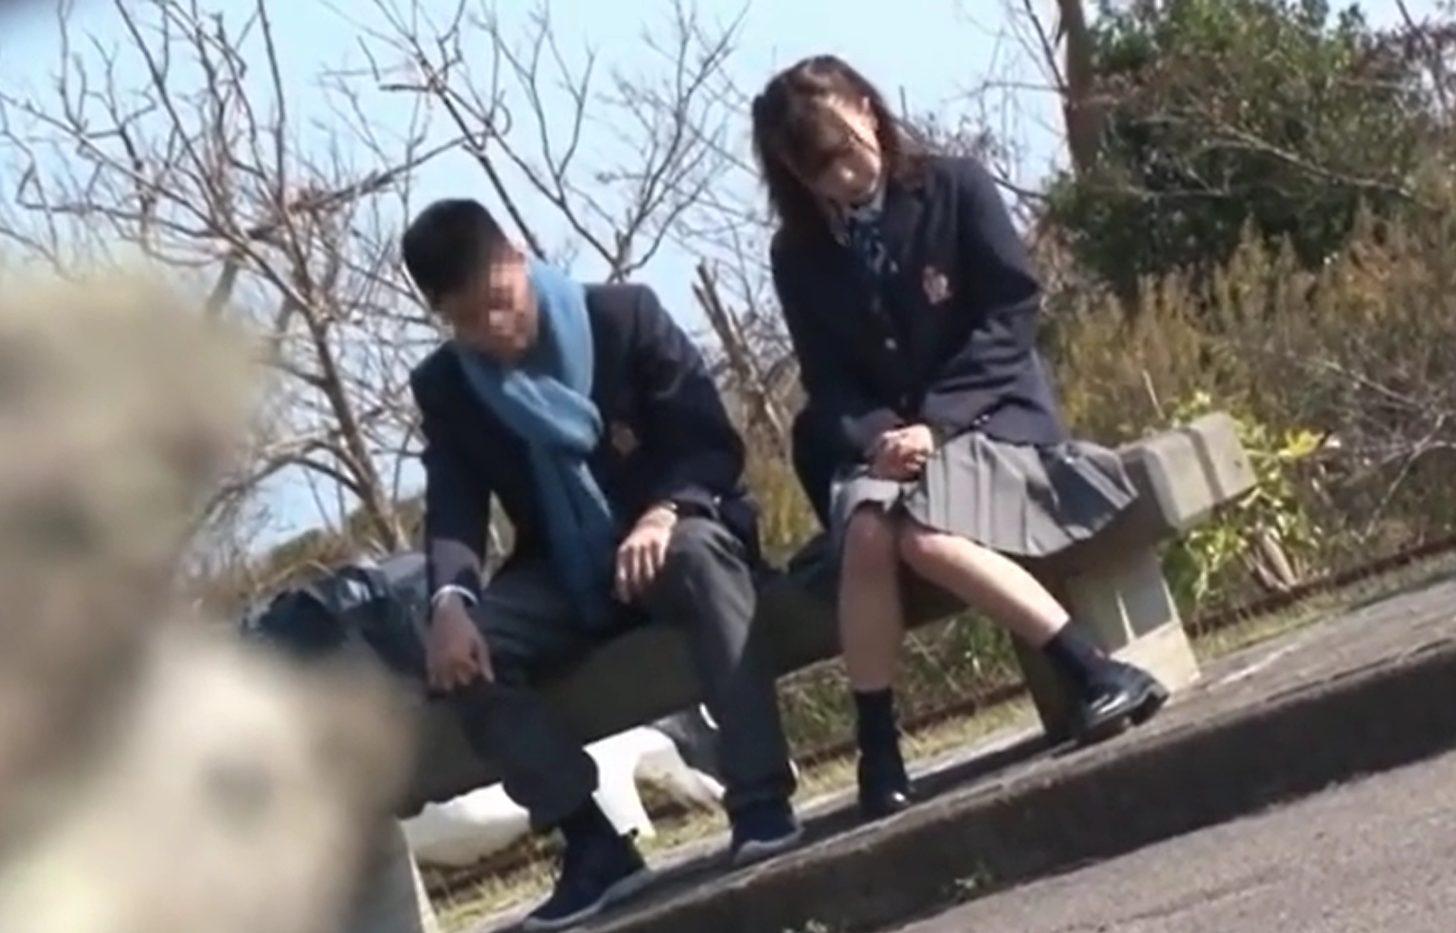 【※JKレイプ※】美少女JKを公園のトイレで犯し尽す!デート終わりのJKを狙い帰り際に襲い掛かり生ハメ…!